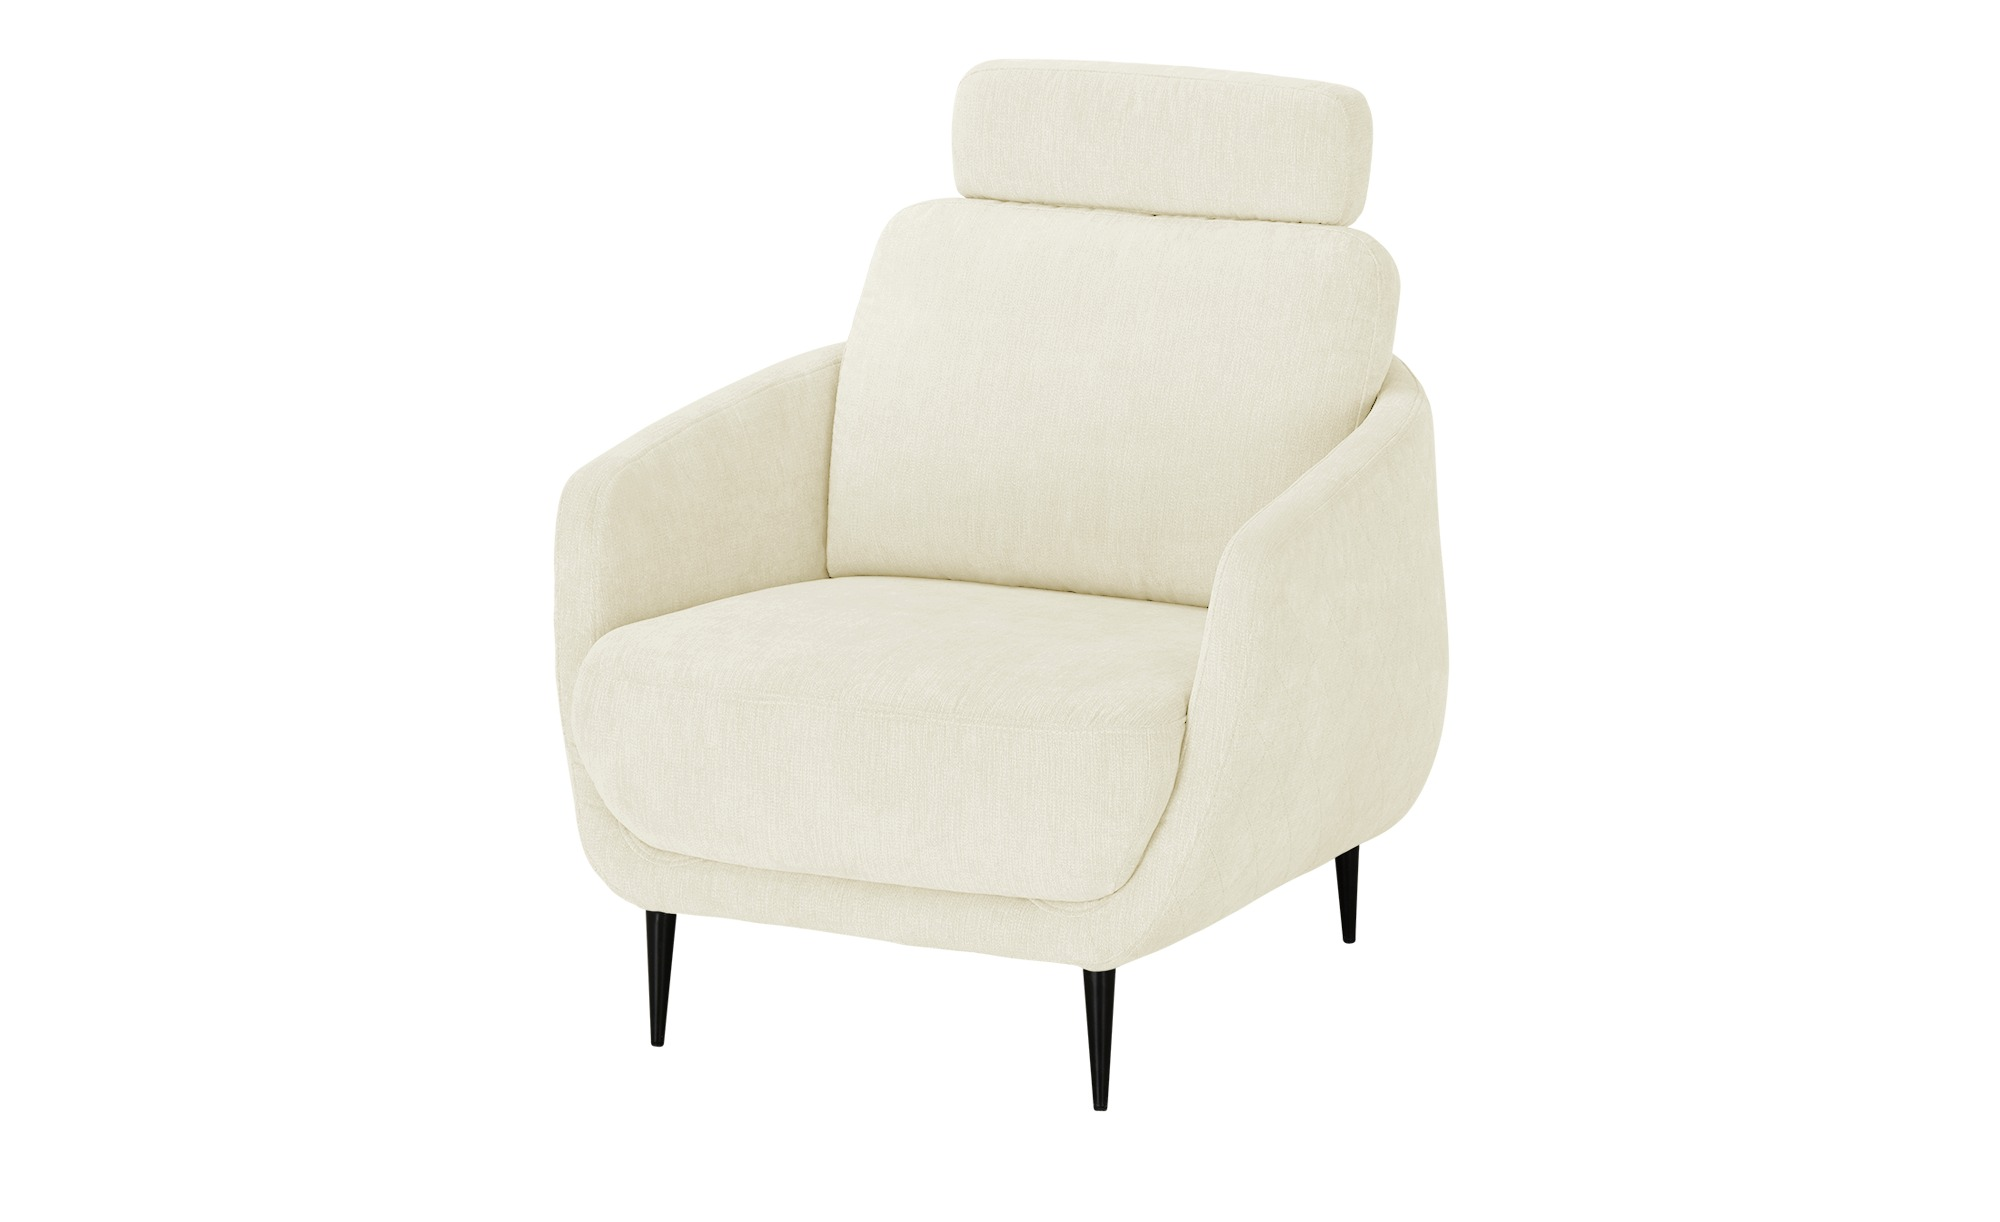 Max Schelling Sessel  Signature ¦ creme ¦ Maße (cm): B: 78 H: 79 T: 88 Polstermöbel > Sessel > Polstersessel - Höffner